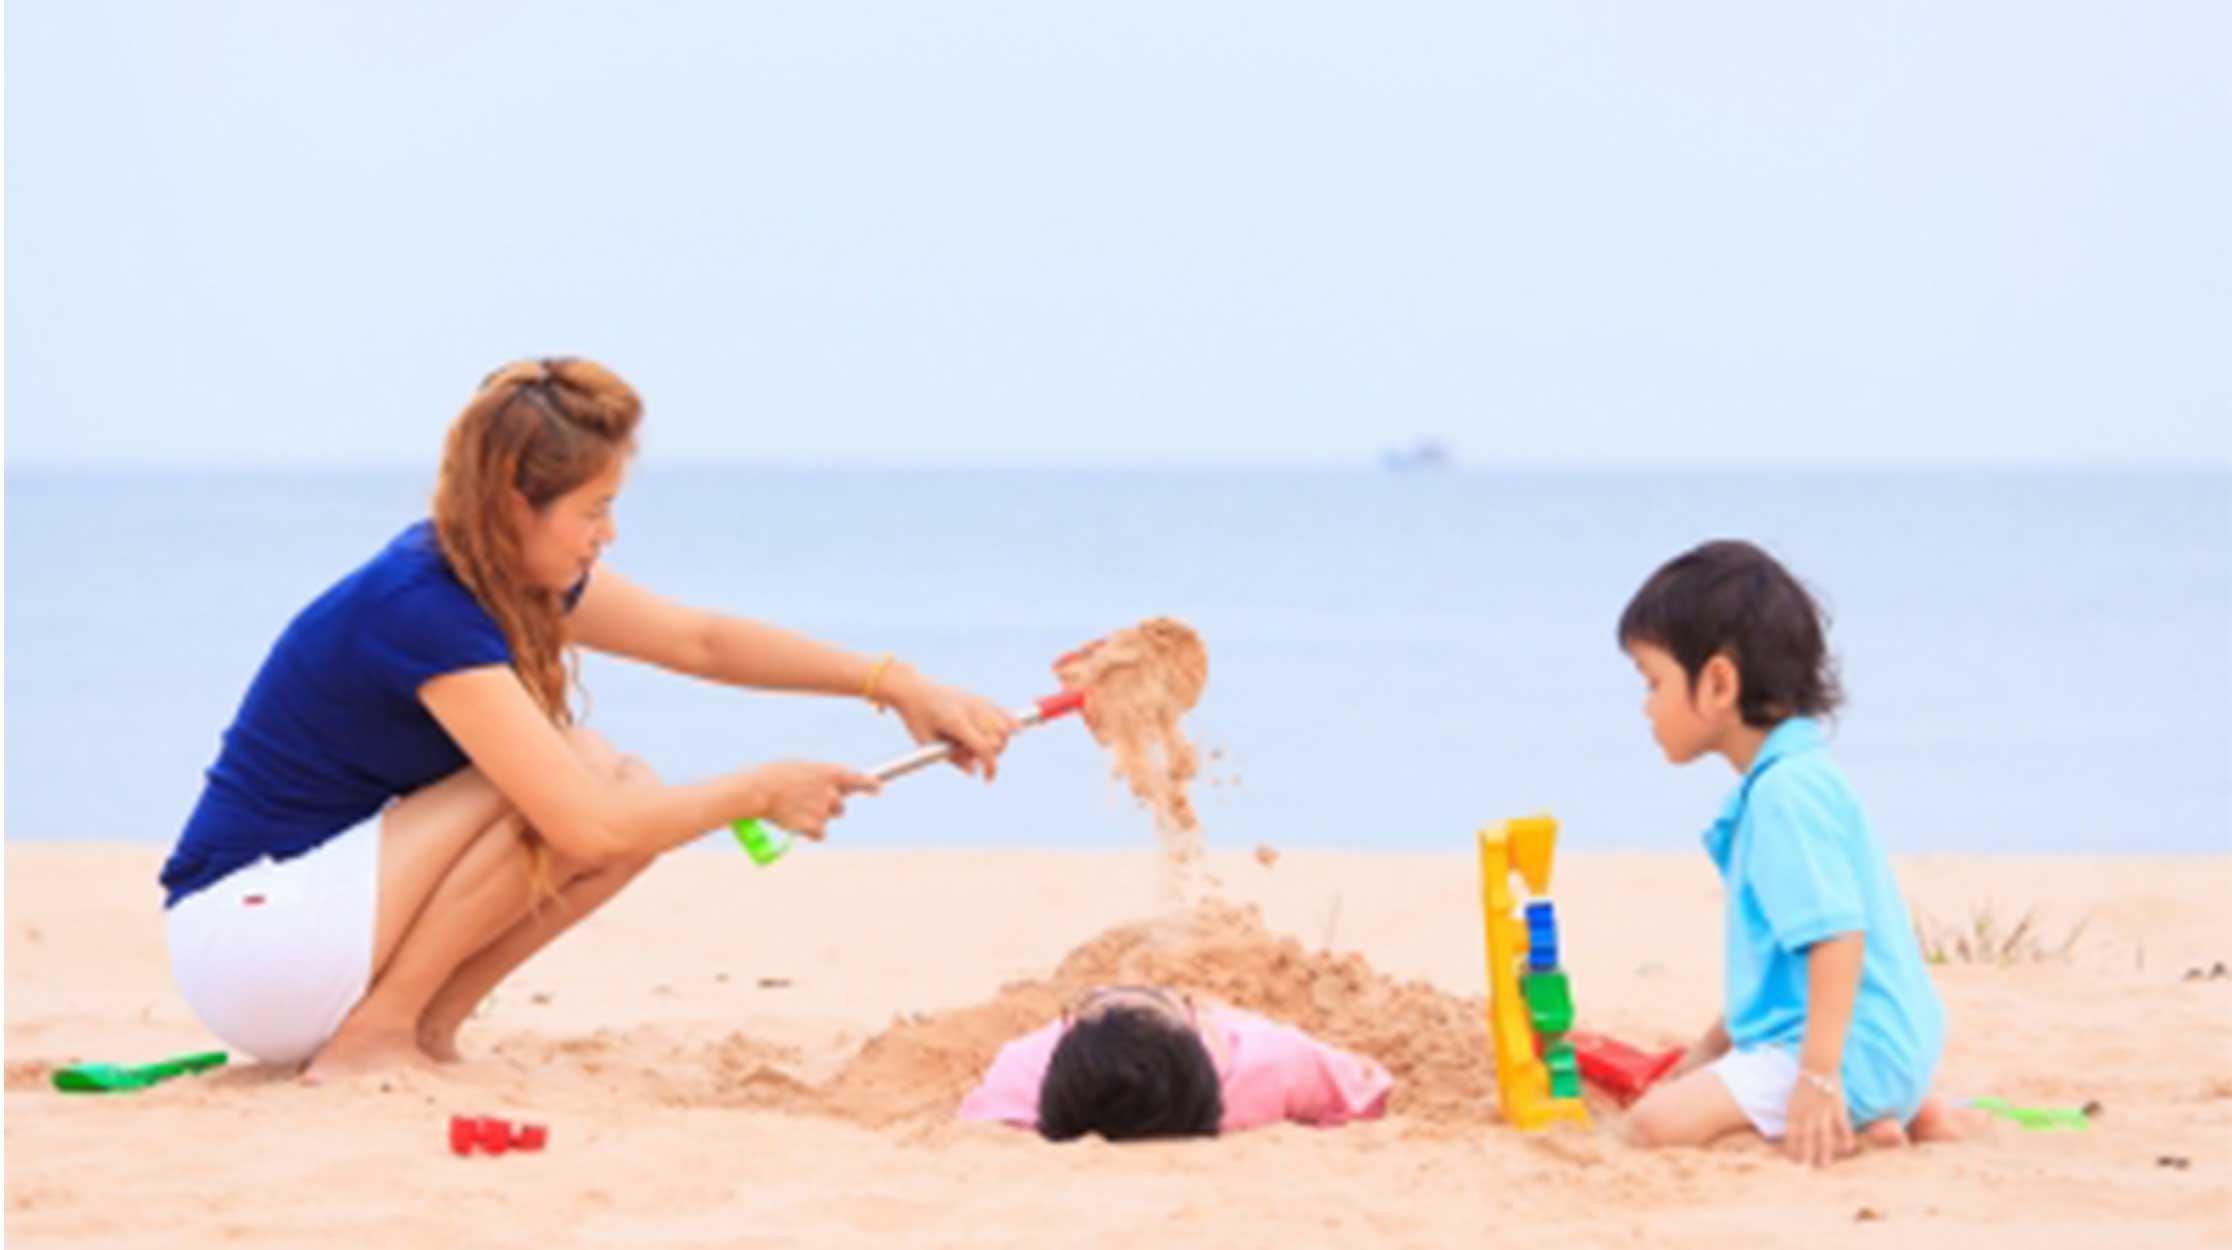 Familia divirtiéndose en la playa